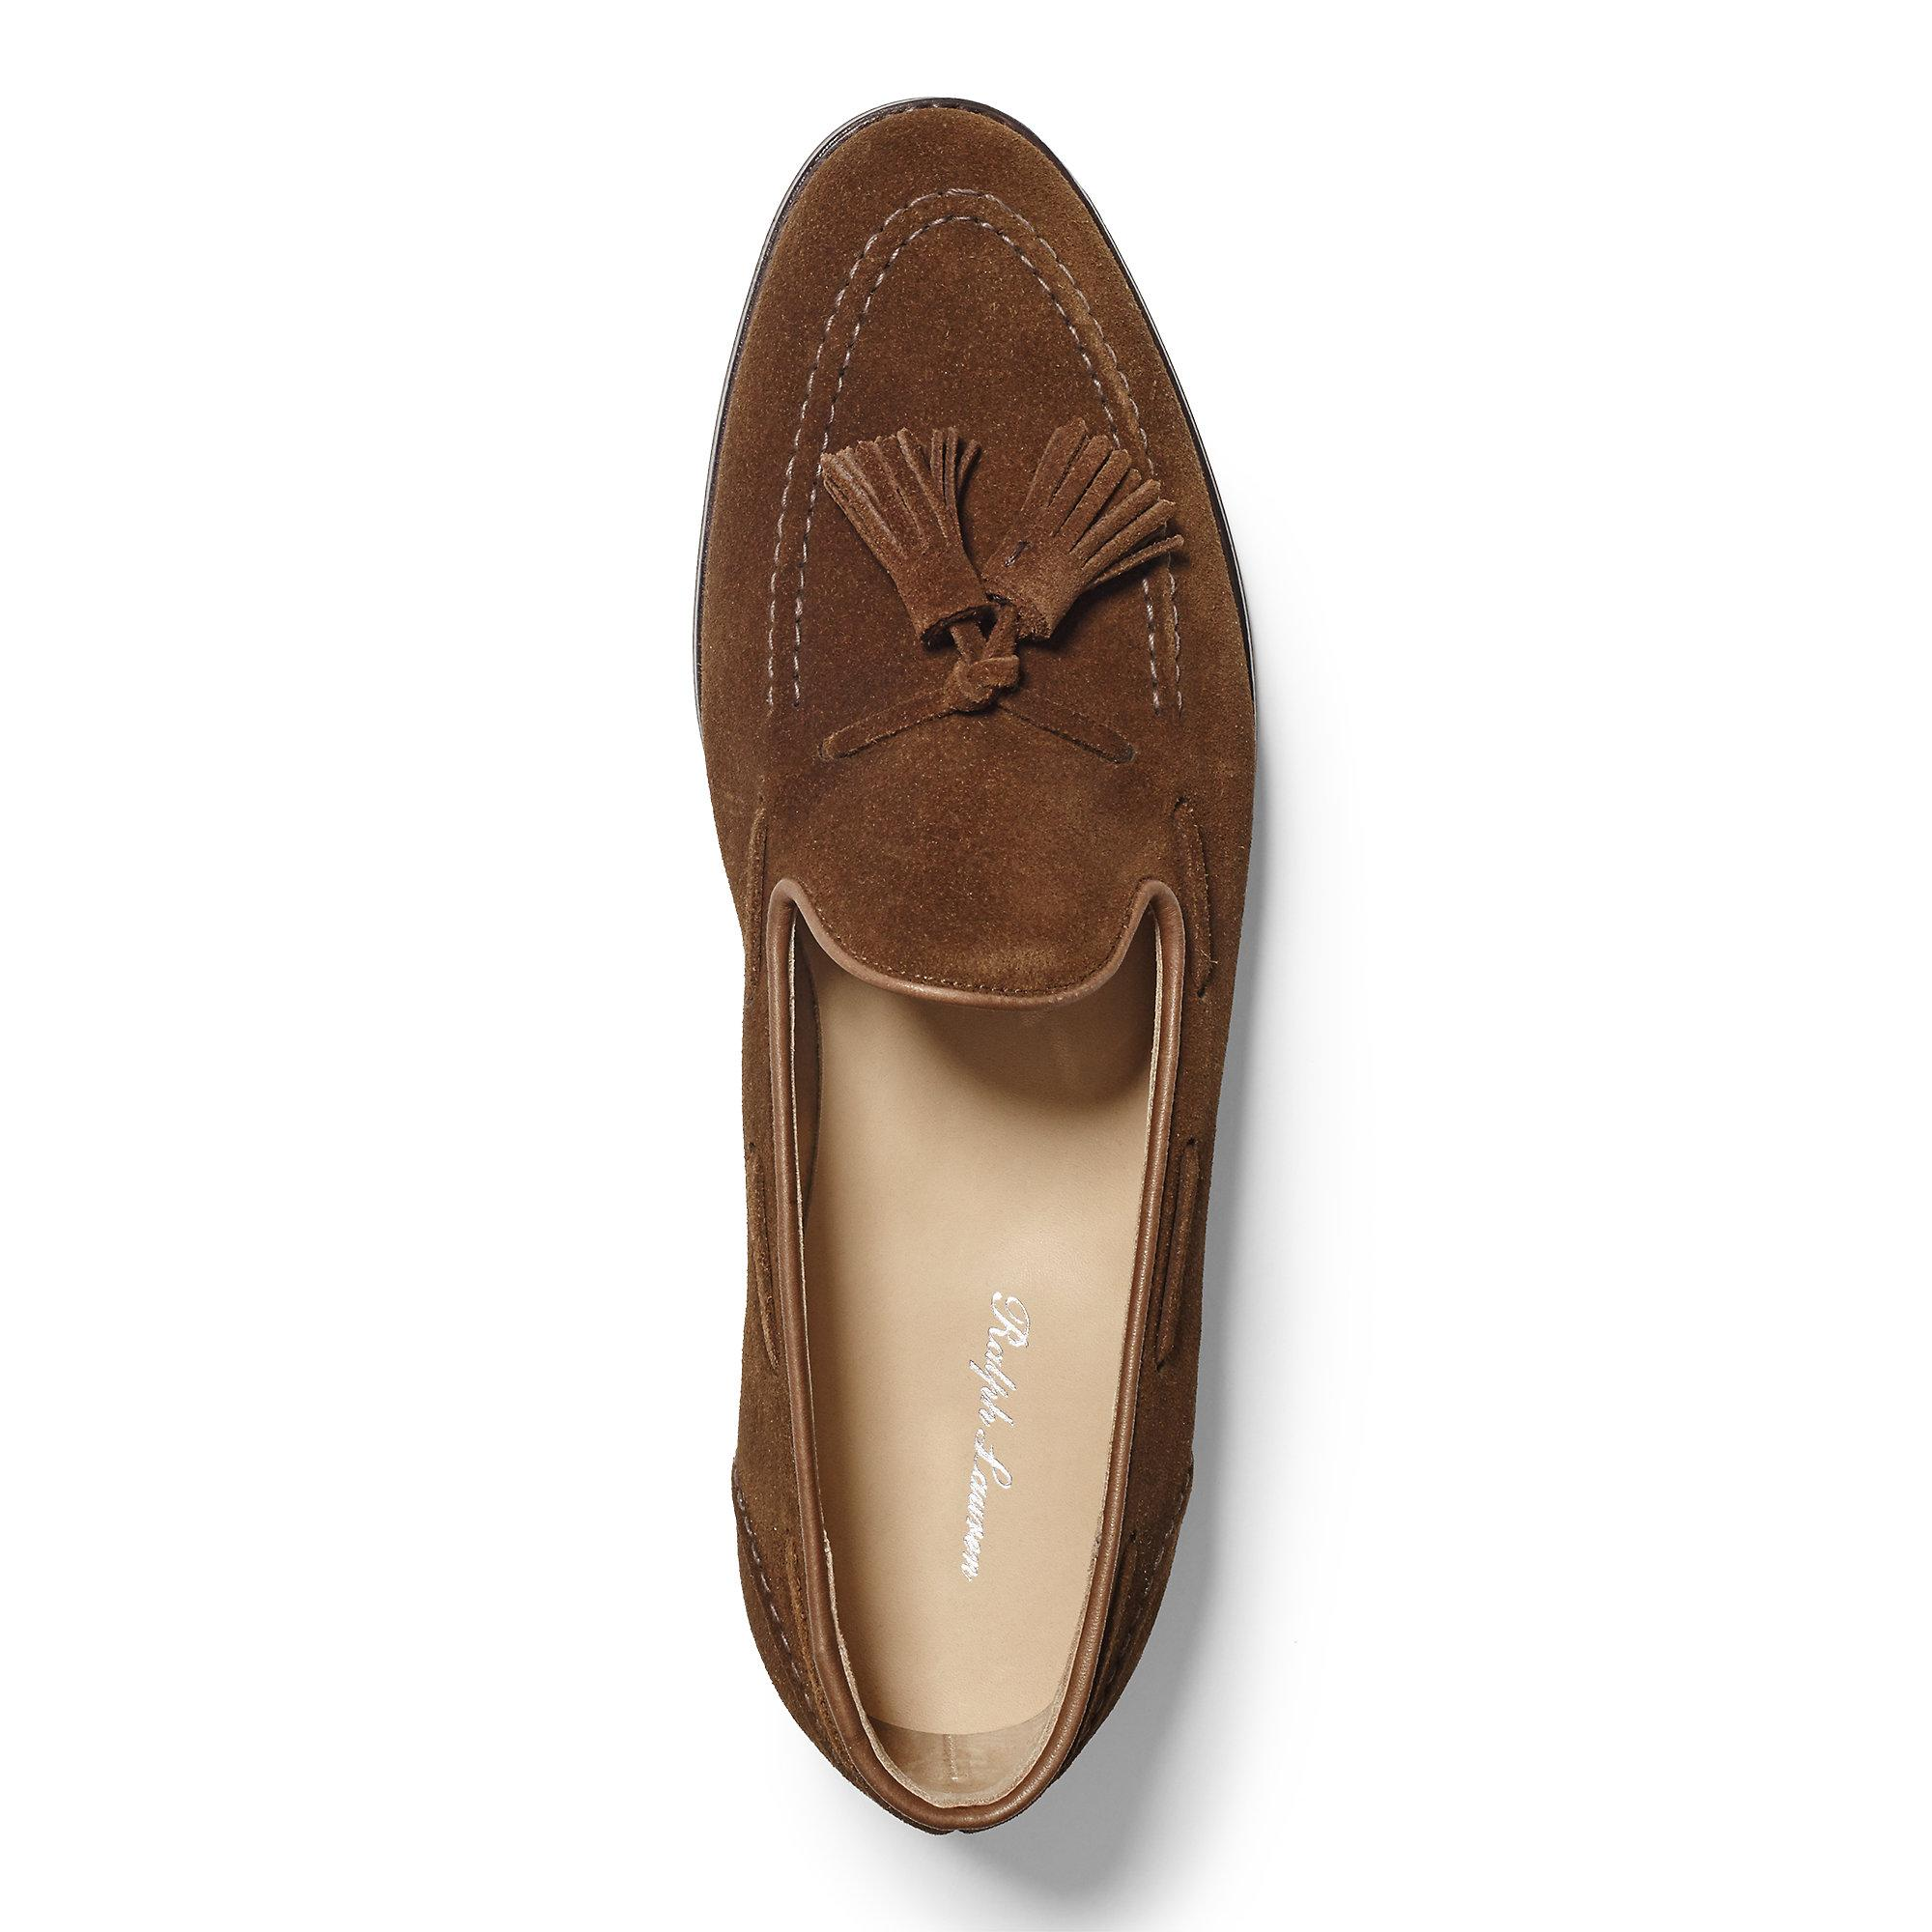 934314378 Ralph Lauren Marlow Suede Tassel Loafer in Brown for Men - Lyst